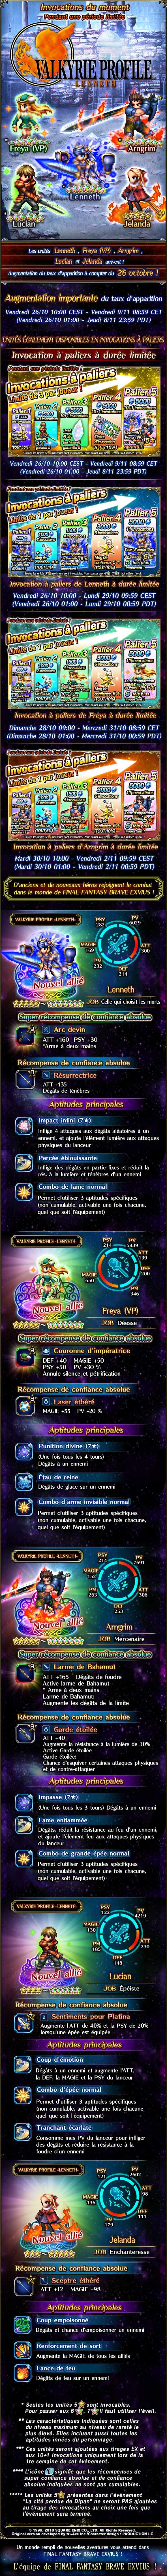 Invocations du moment - Collab Valkyrie Profile ValkyrieProfileFeatureSummon